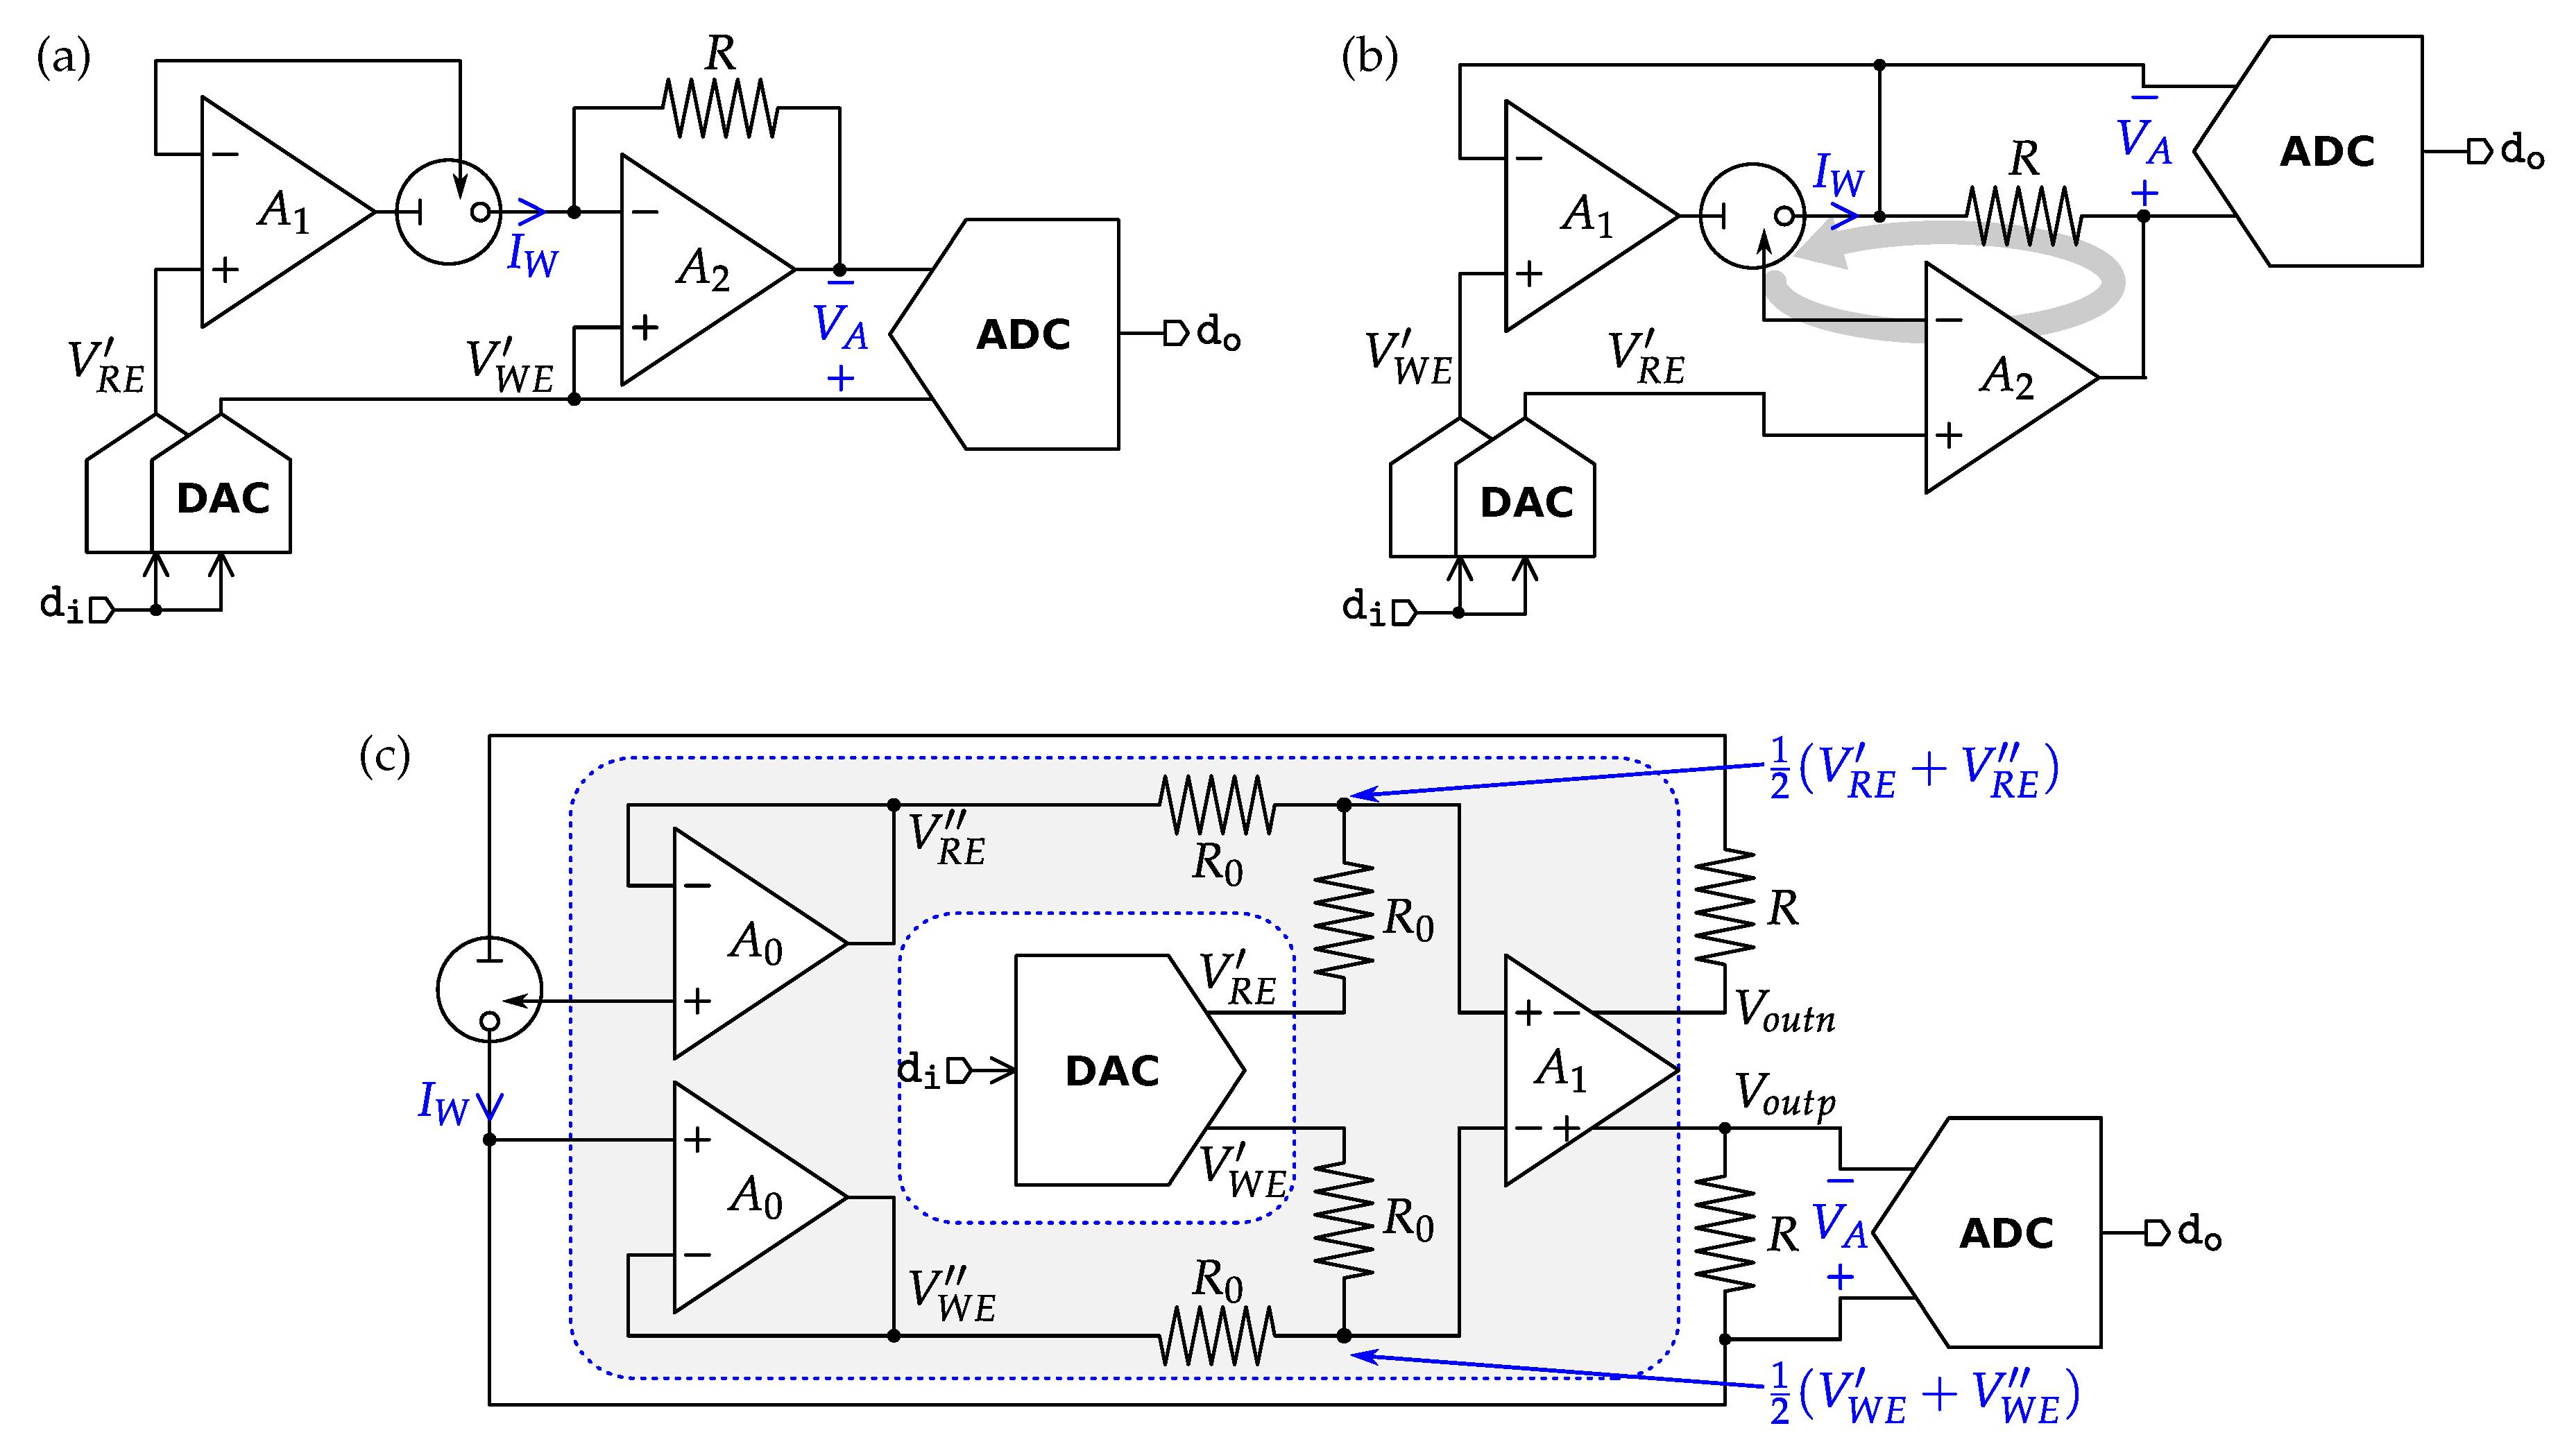 Pin By John Houston On Wiring Diagram Sample In